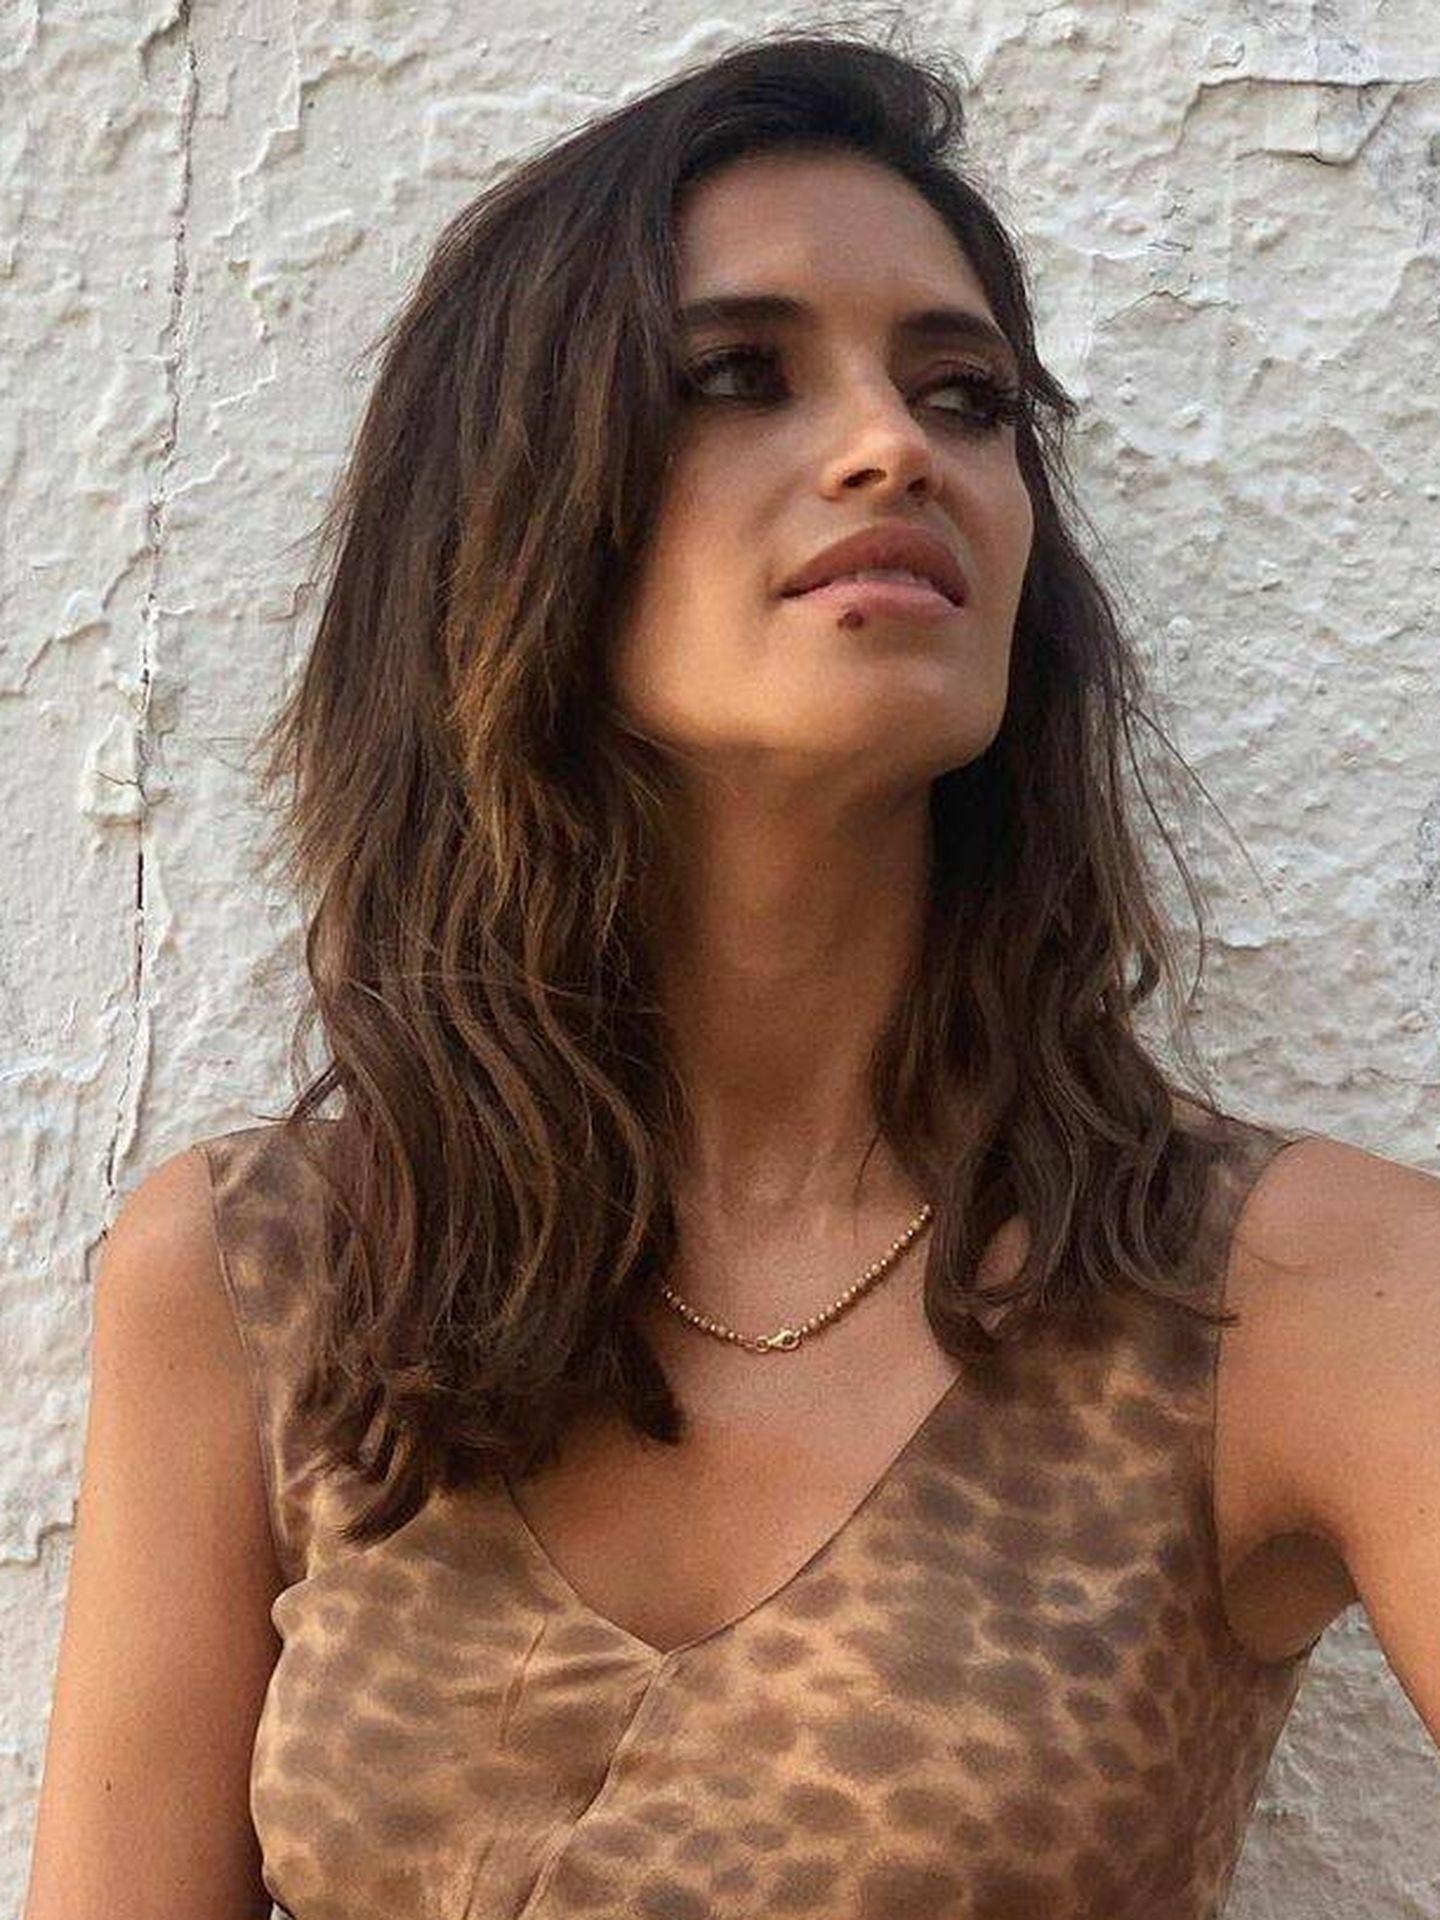 Sara Carbonero, con la melena ondulada. (Instagram @saracarbonero)